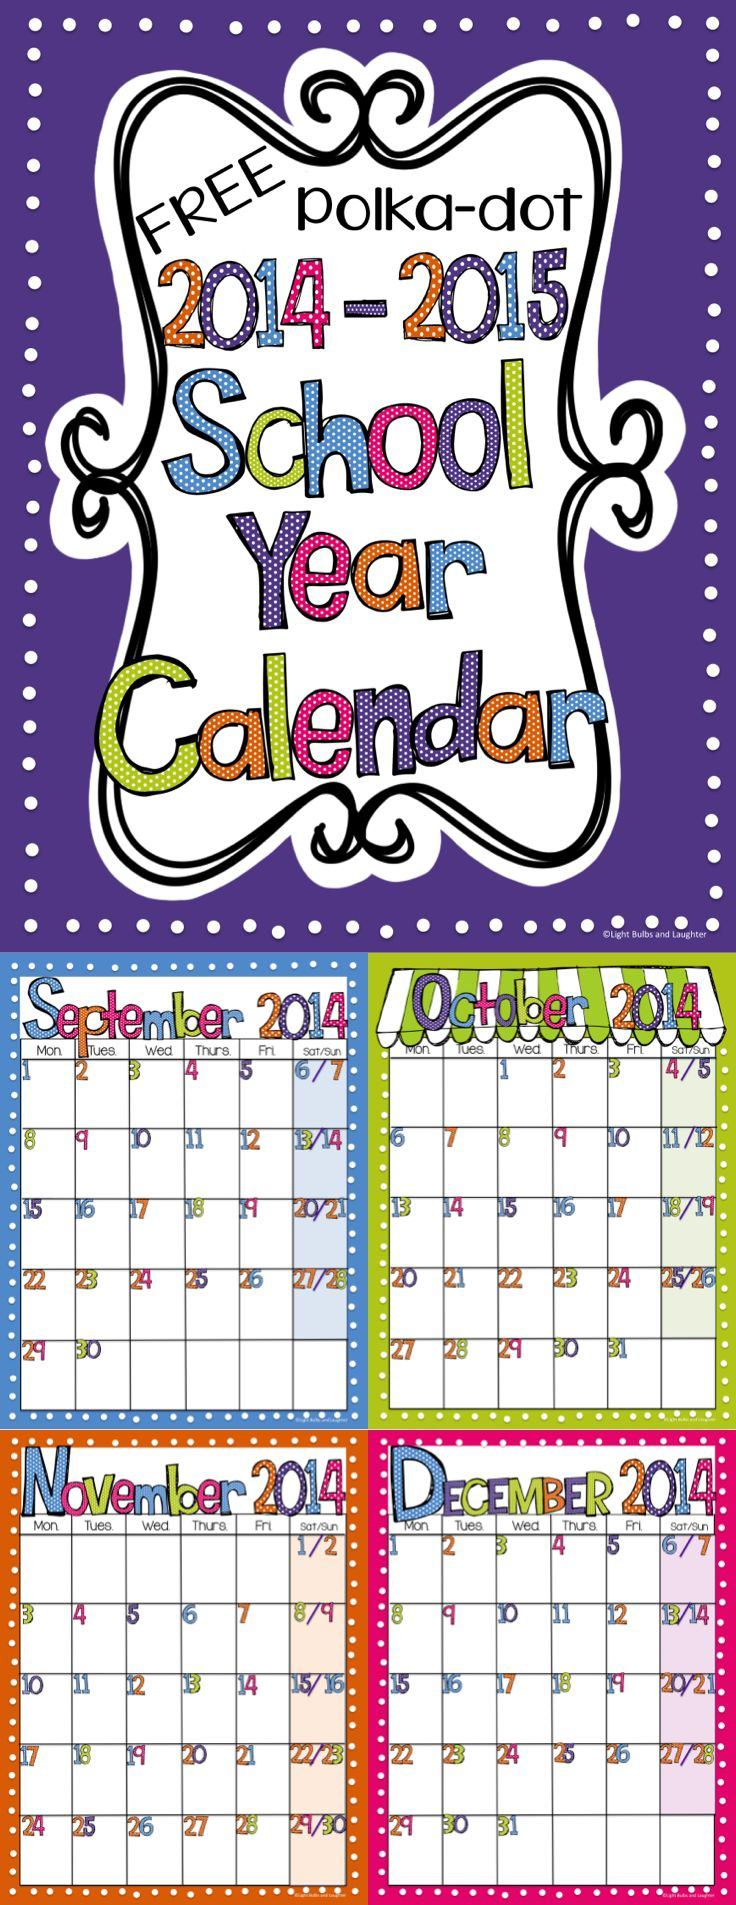 Free Editable (PowerPoint) Calendar 2014 -15 School Year - Bright Polka dots.